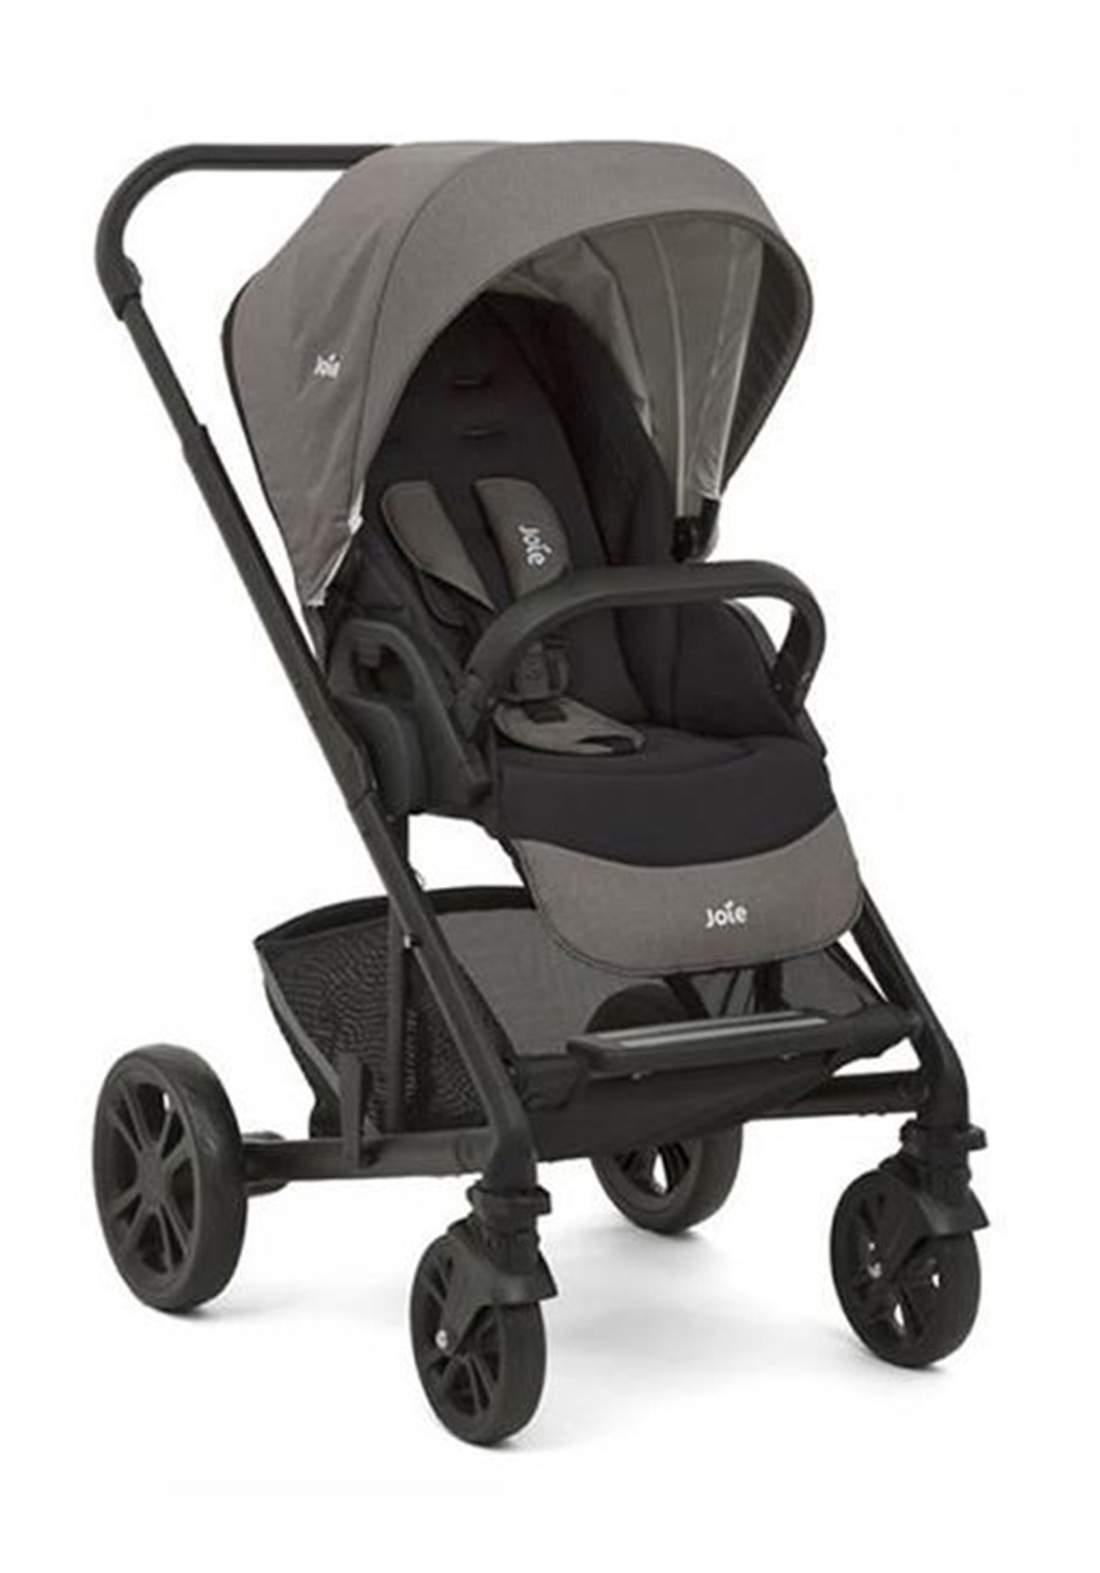 عربة اطفال 11.8 كغم Joie Baby S1201IBFGY000 Chrome Pushchair 4 Wheel Pushchair Stroller - Grey